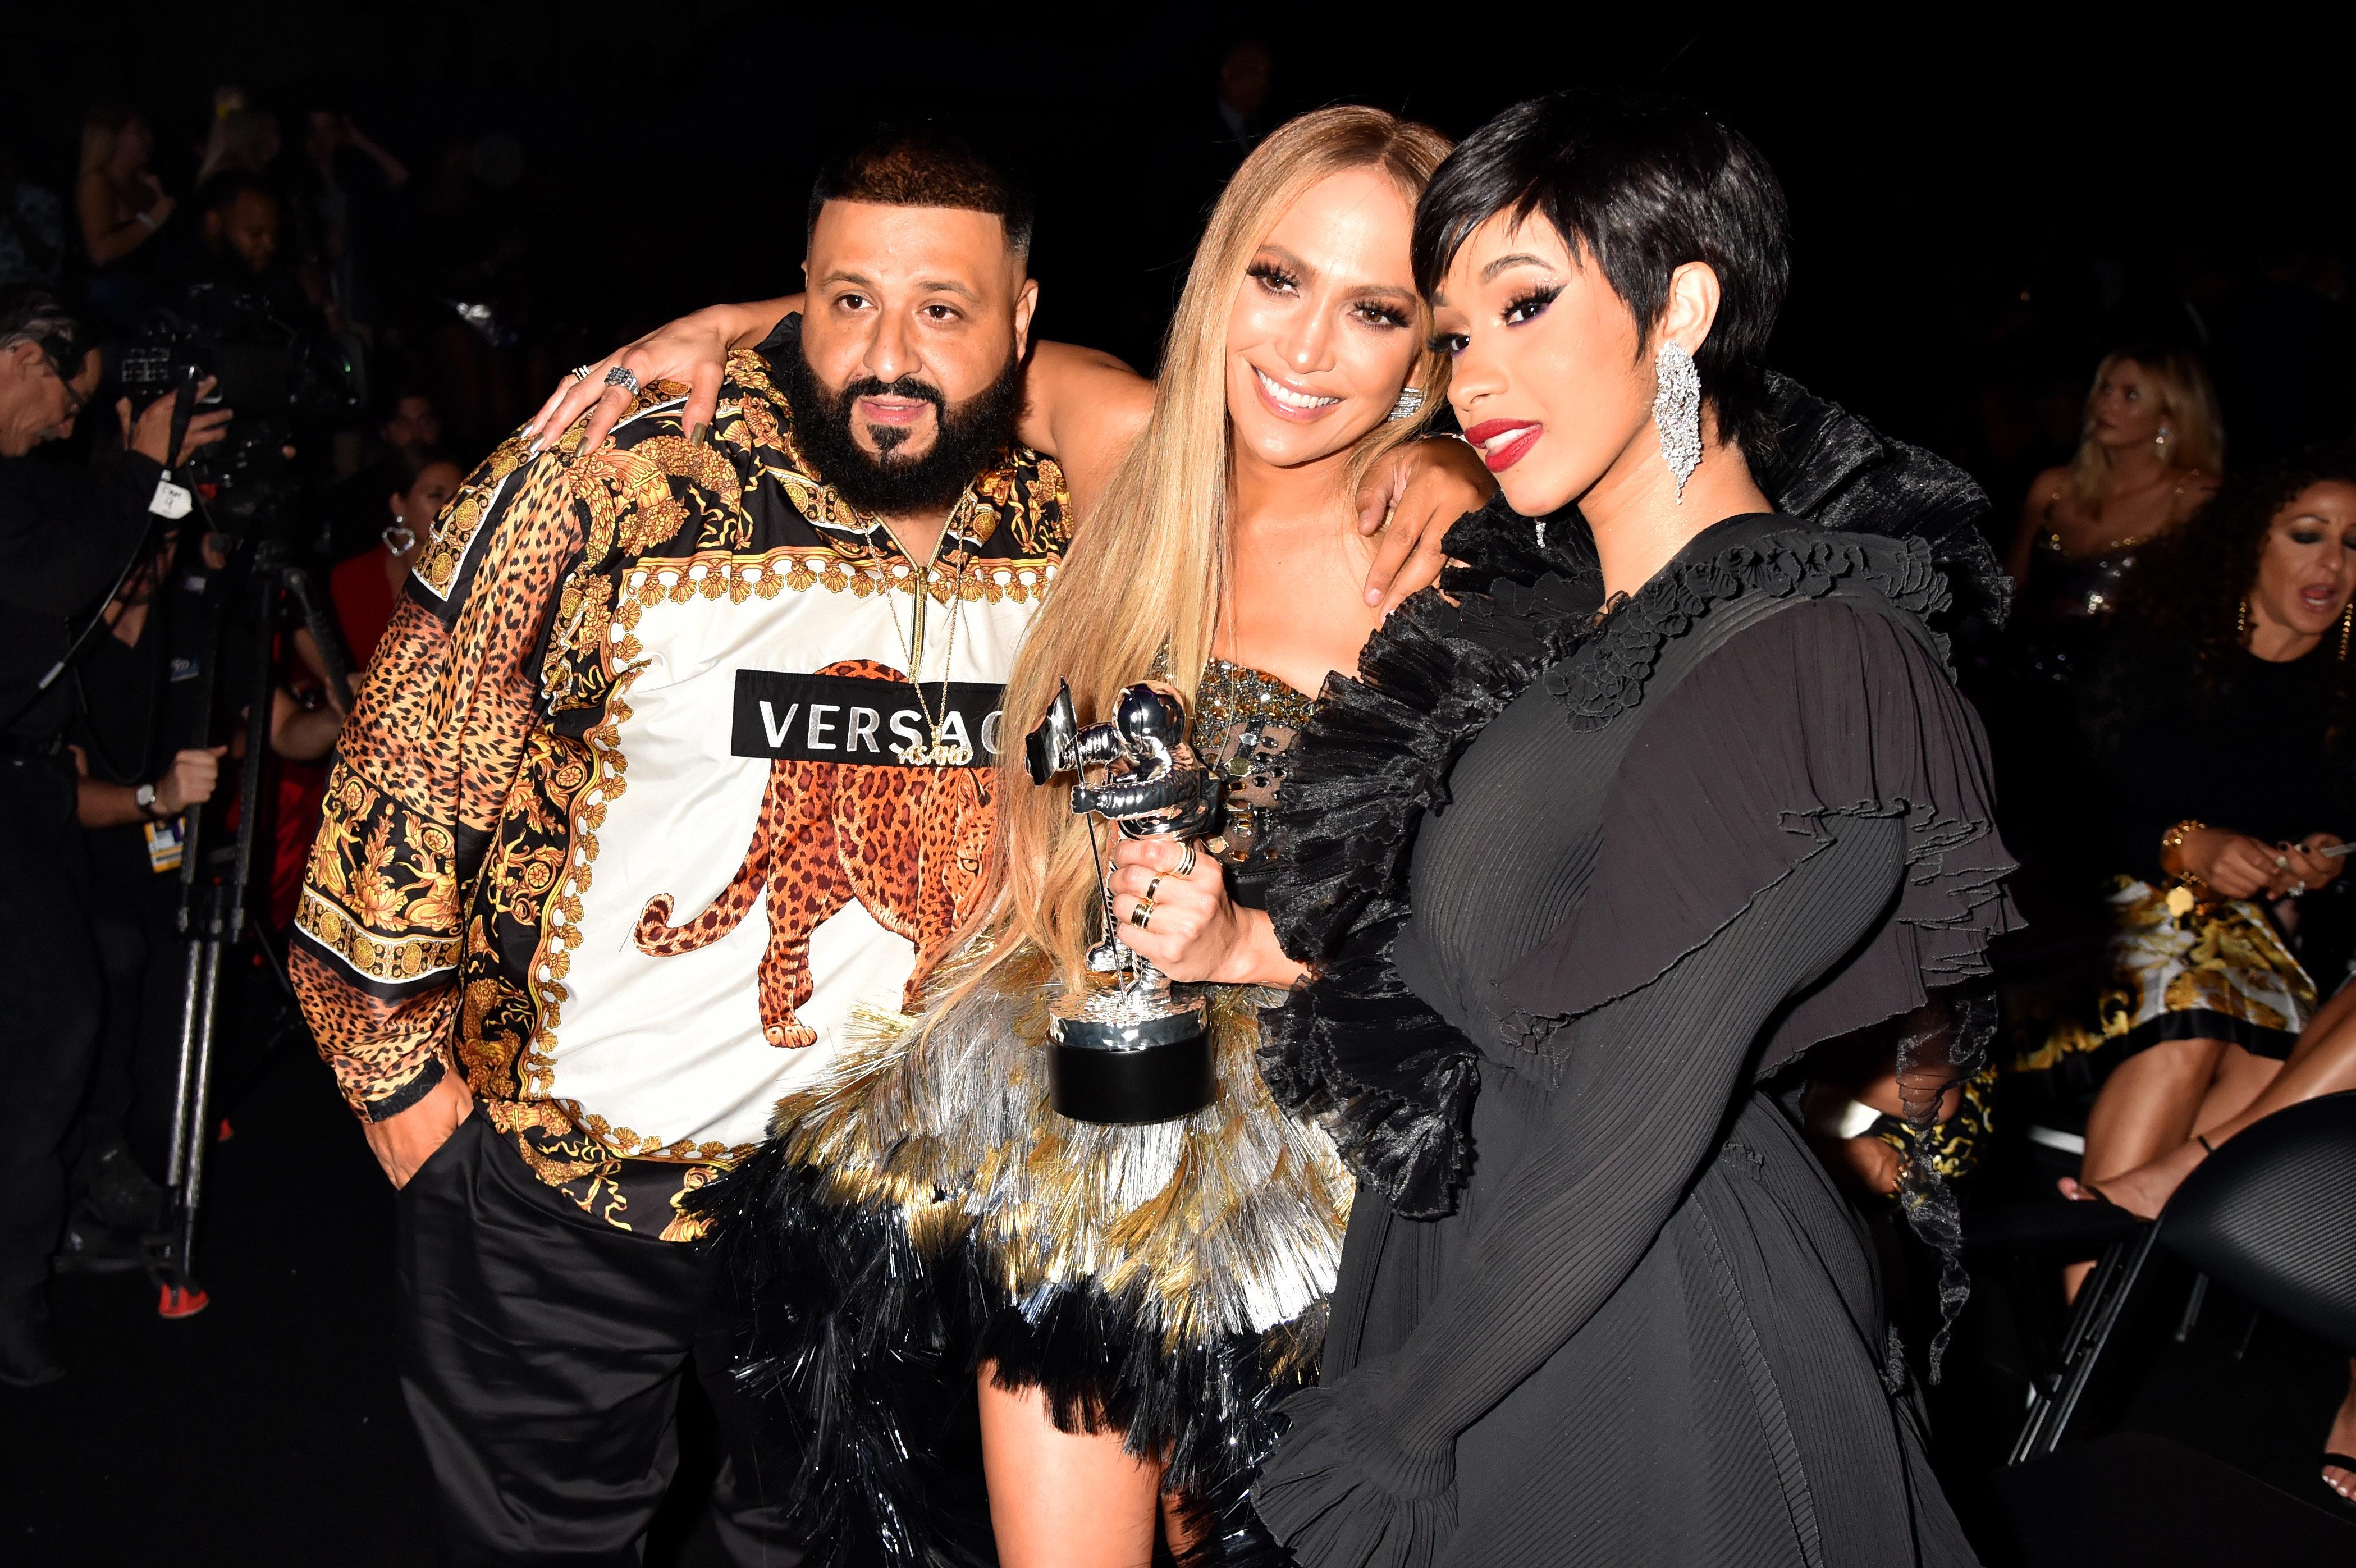 NEW YORK, NY - AUGUST 20:  DJ Khalid, Jennifer Lopez and Cardi B attend the 2018 MTV Video Music Awards at Radio City Music Hall on August 20, 2018 in New York City.  (Photo by Jeff Kravitz/FilmMagic)